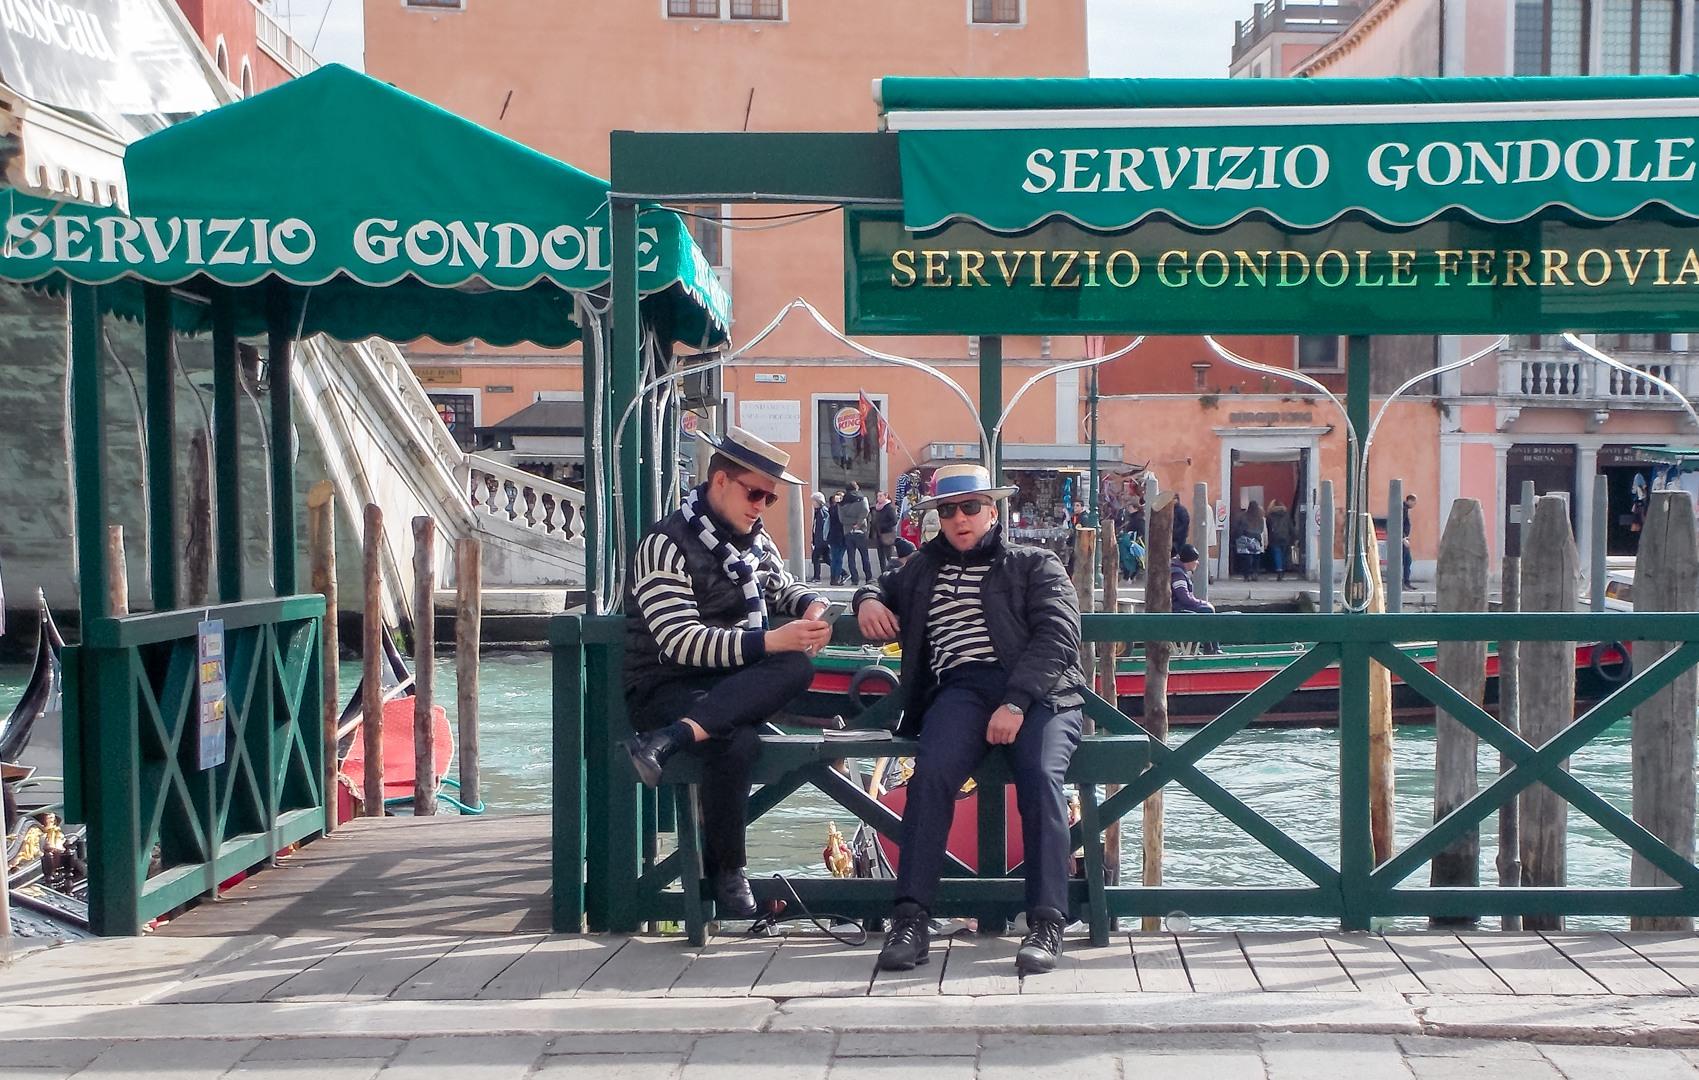 Водители гондол, Венеция, Италия